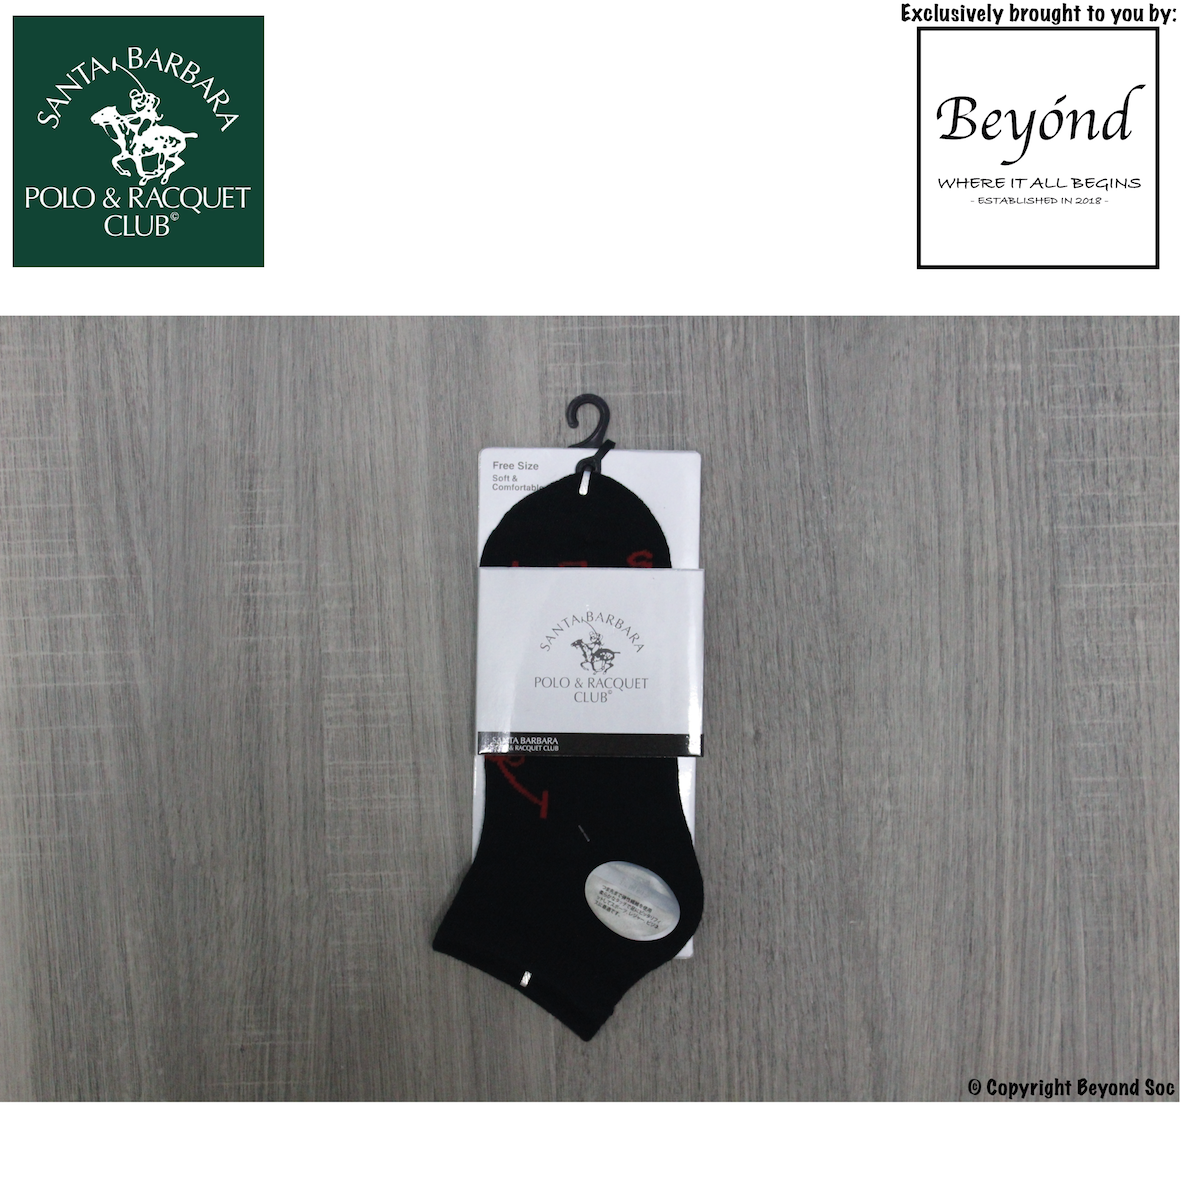 [Value Buy] Santa Barbara Polo & Racquet Club - Ankle Socks